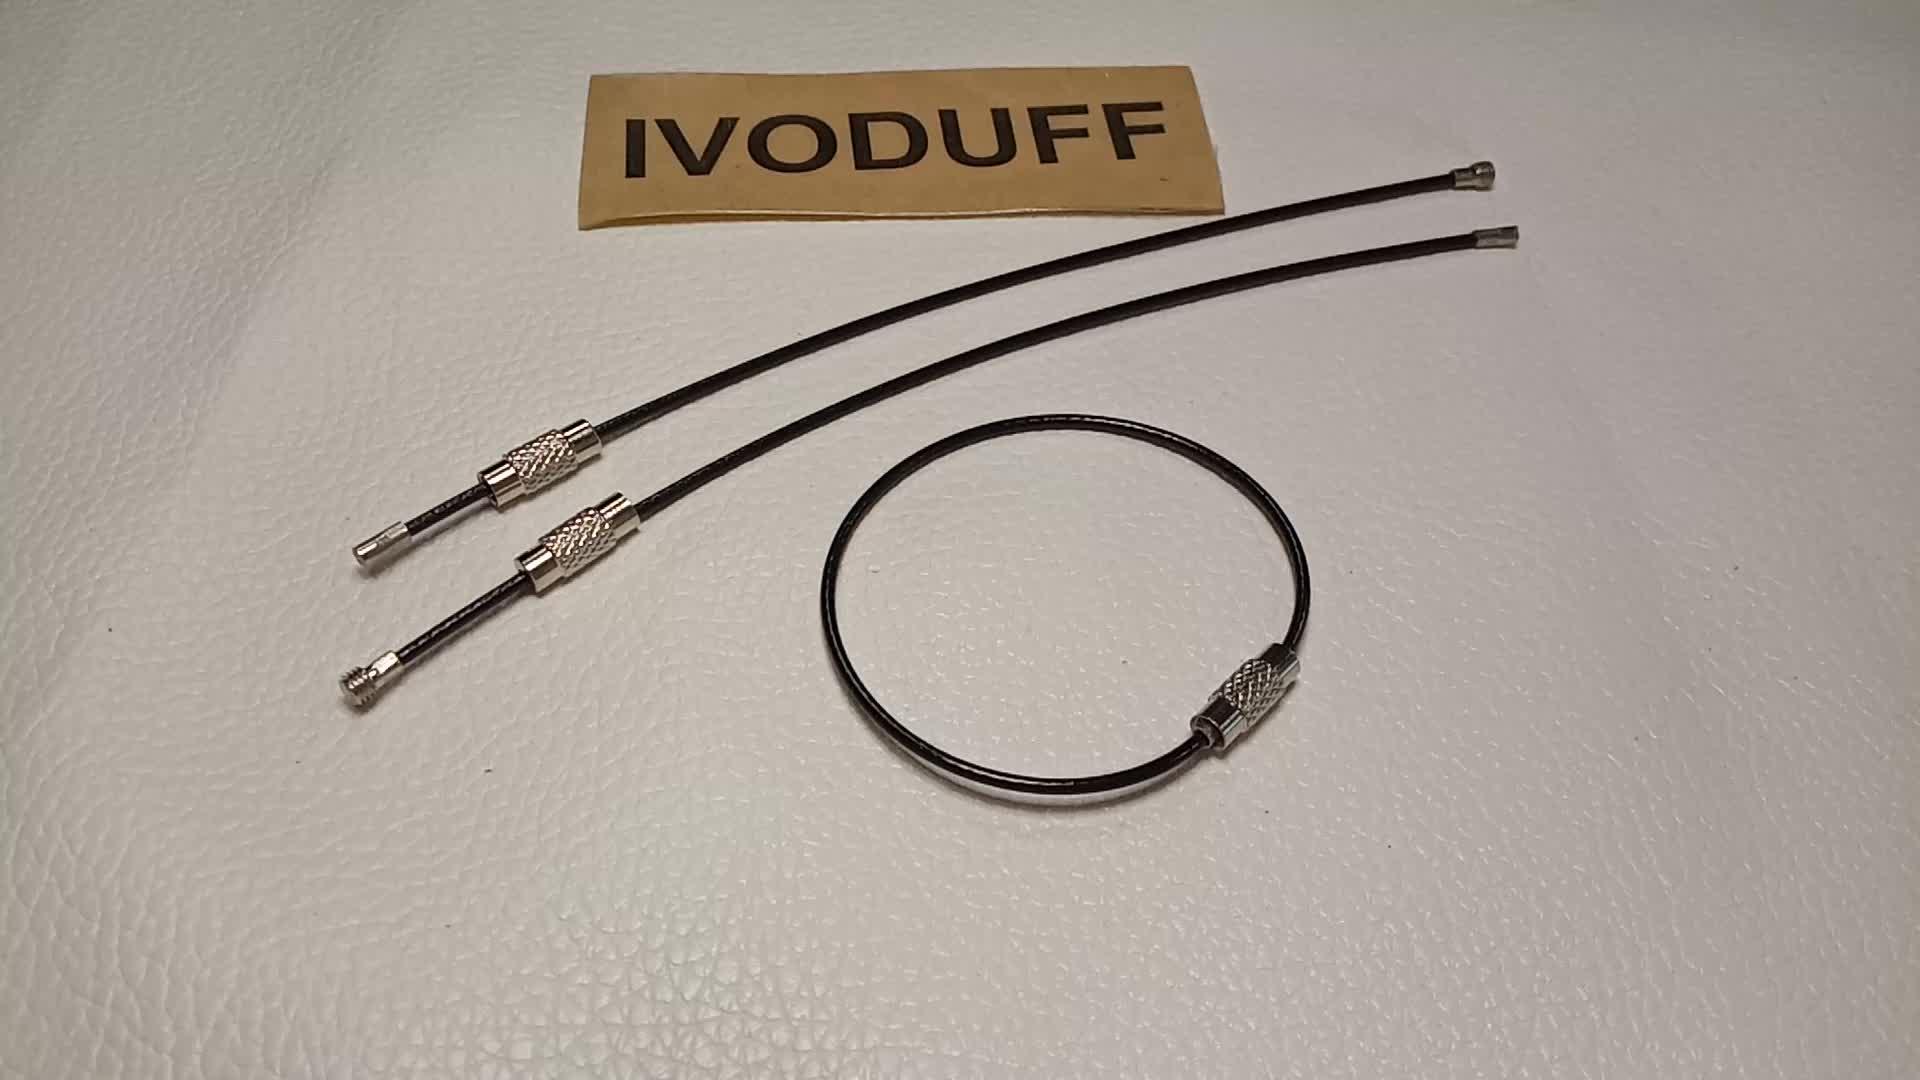 Anel chave chaveiro chaveiro fio de aço inoxidável corda círculo loop de cabo ao ar livre de acampamento bagagem tag parafuso de bloqueio do dispositivo